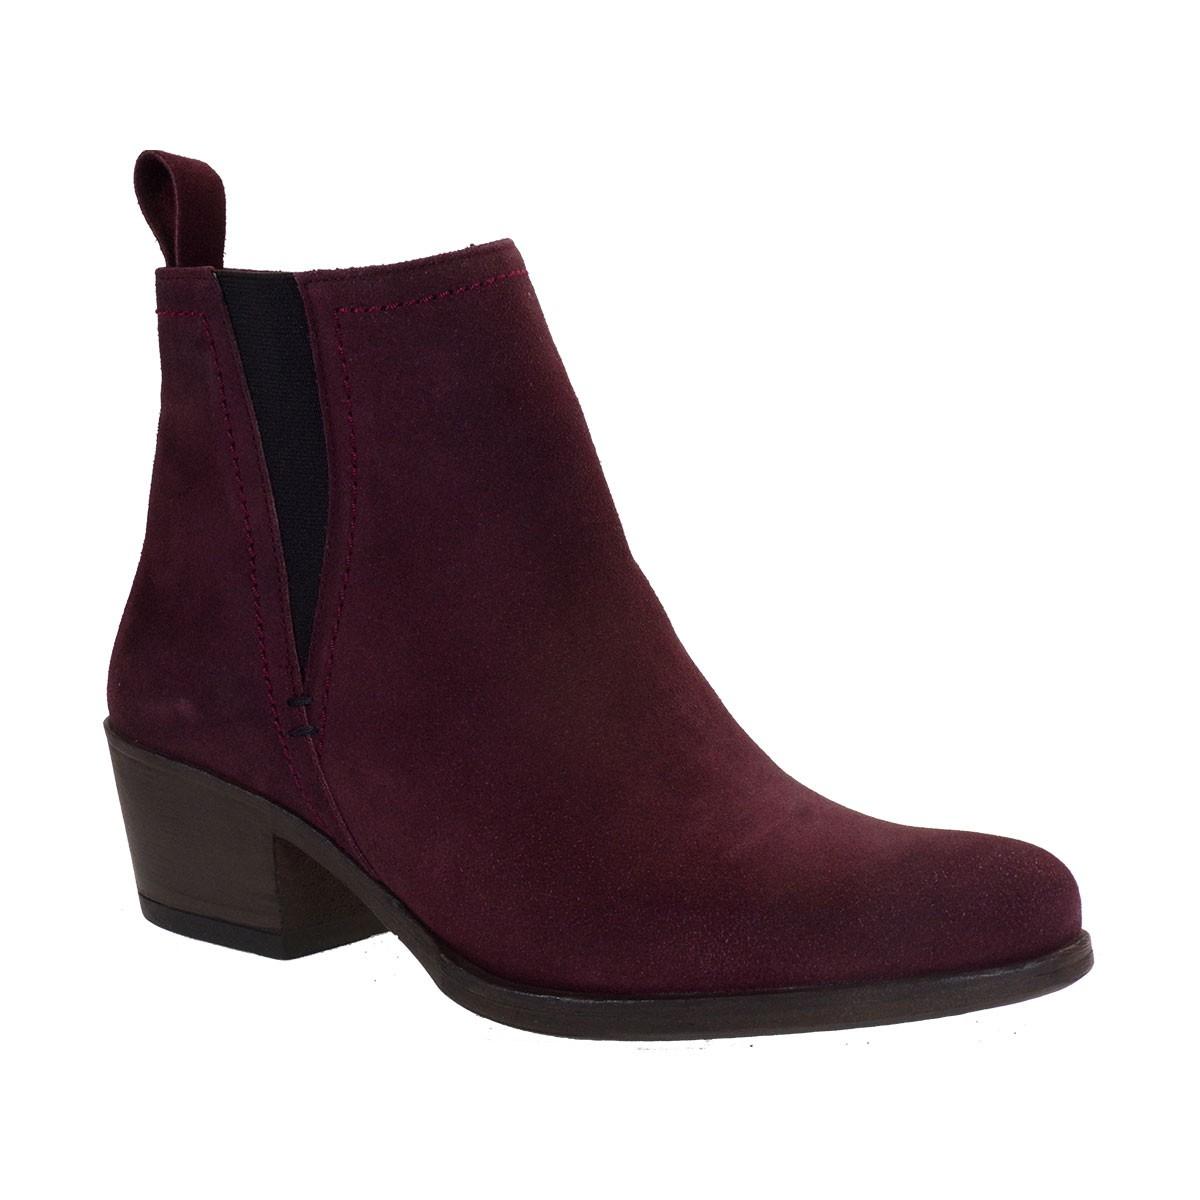 Commanchero Γυναικεία Παπούτσια Μποτάκια COW BOY 5569-425 Μπορντώ Καστόρι Δέρμα